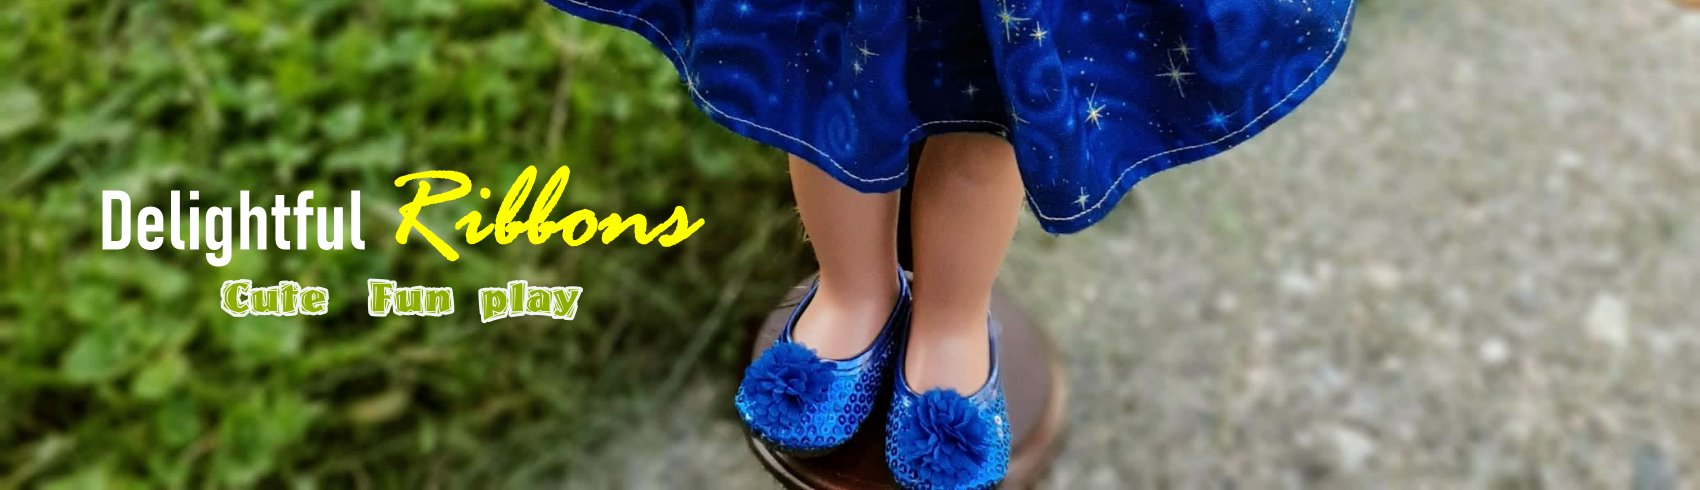 doll-clothes-header4.jpg